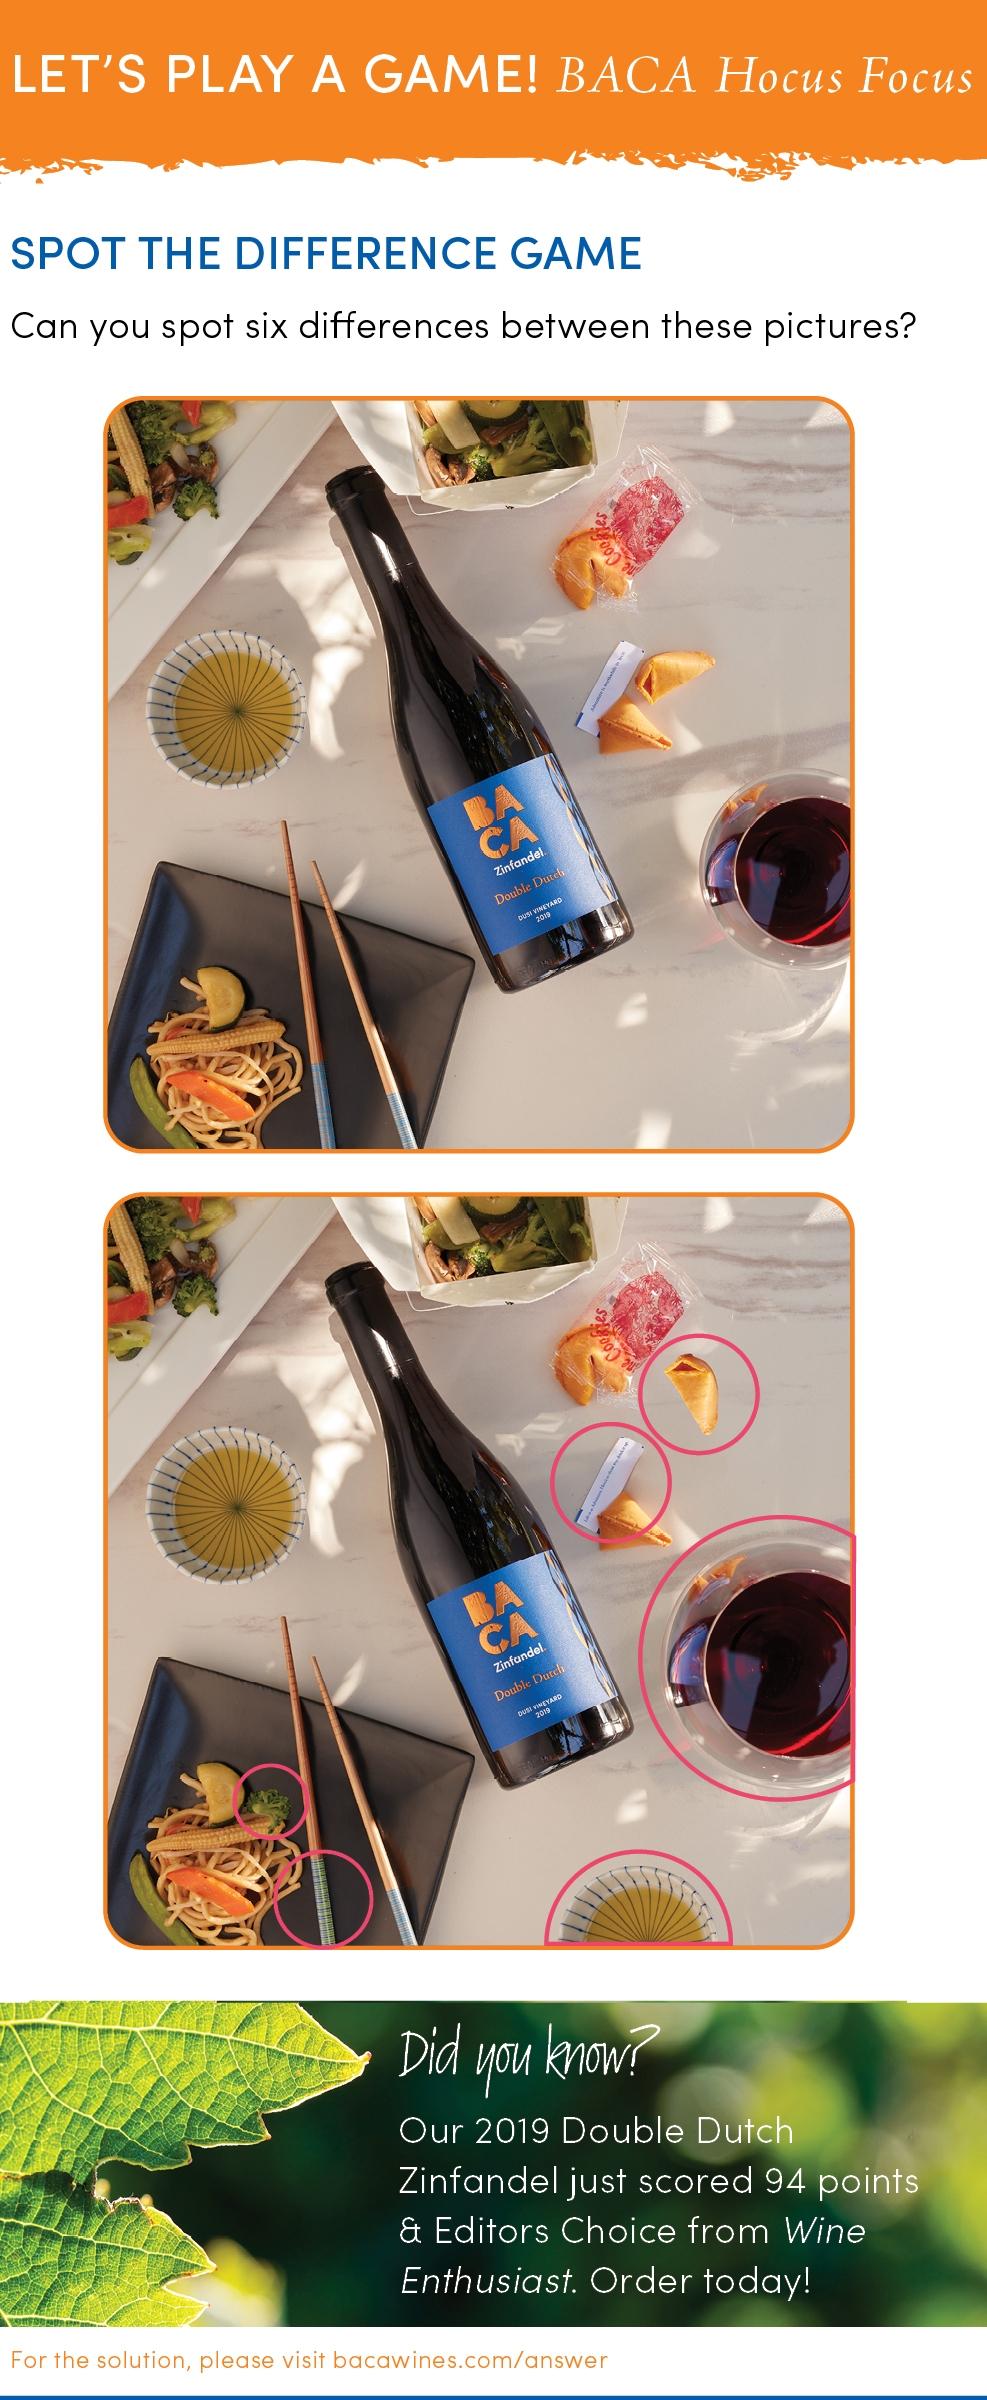 Harvest Hocus Pocus Solution image with BACA Bottle of Zinfandel, glass, Chinese food image